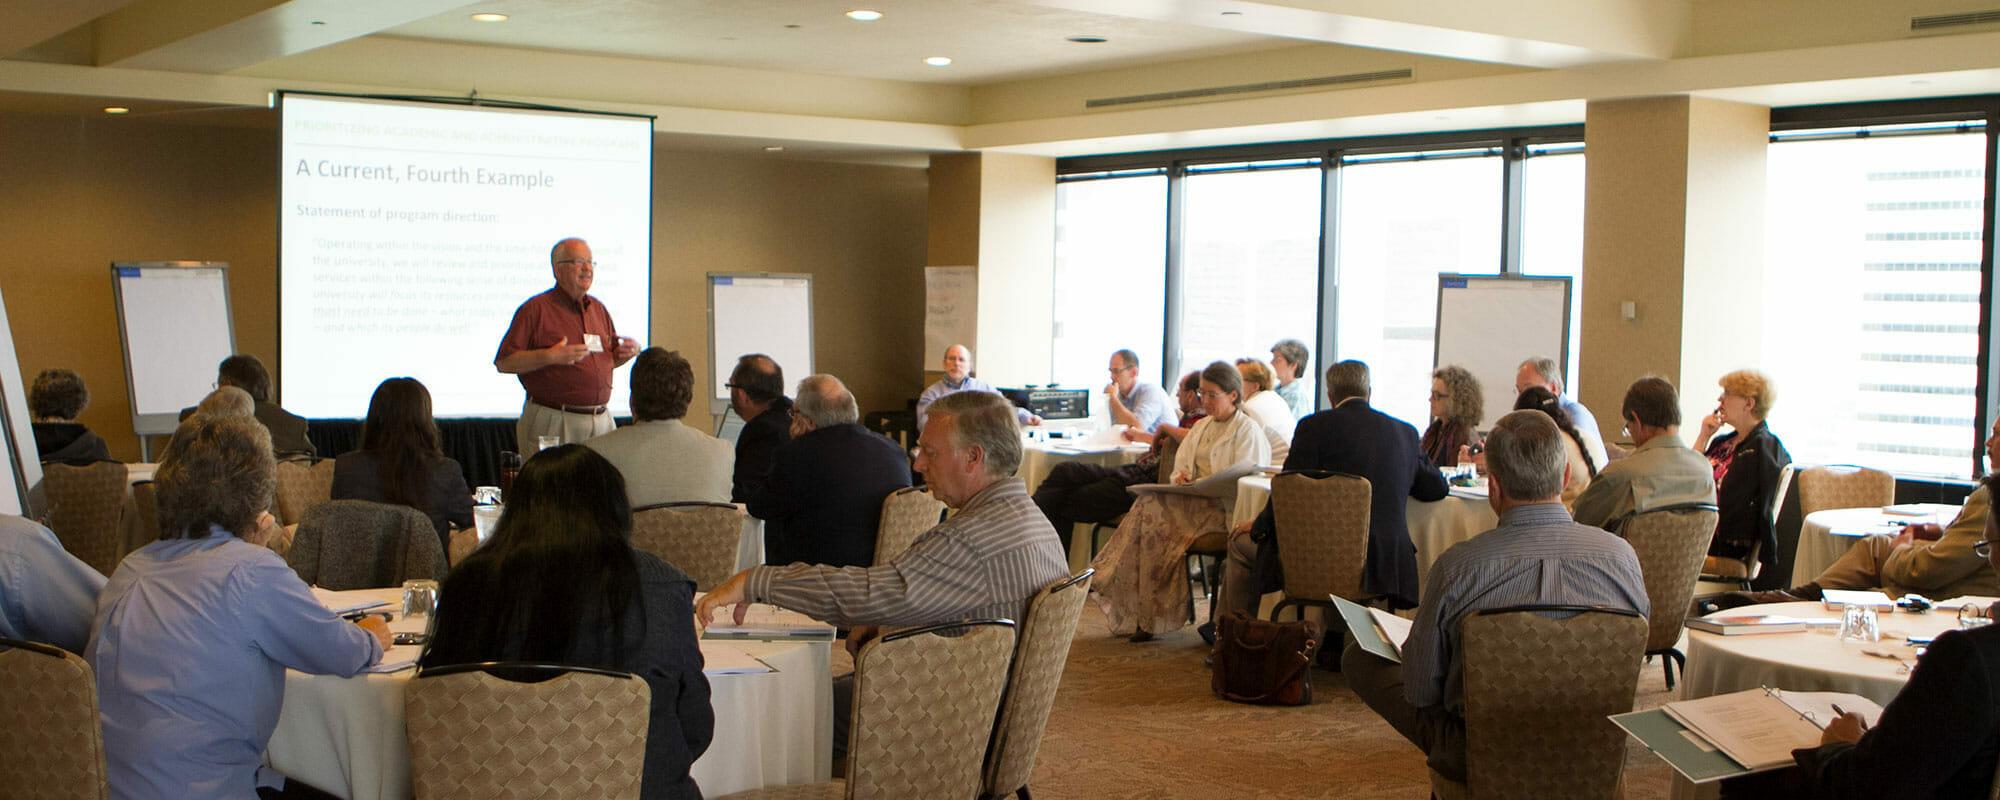 conference-prioritization1